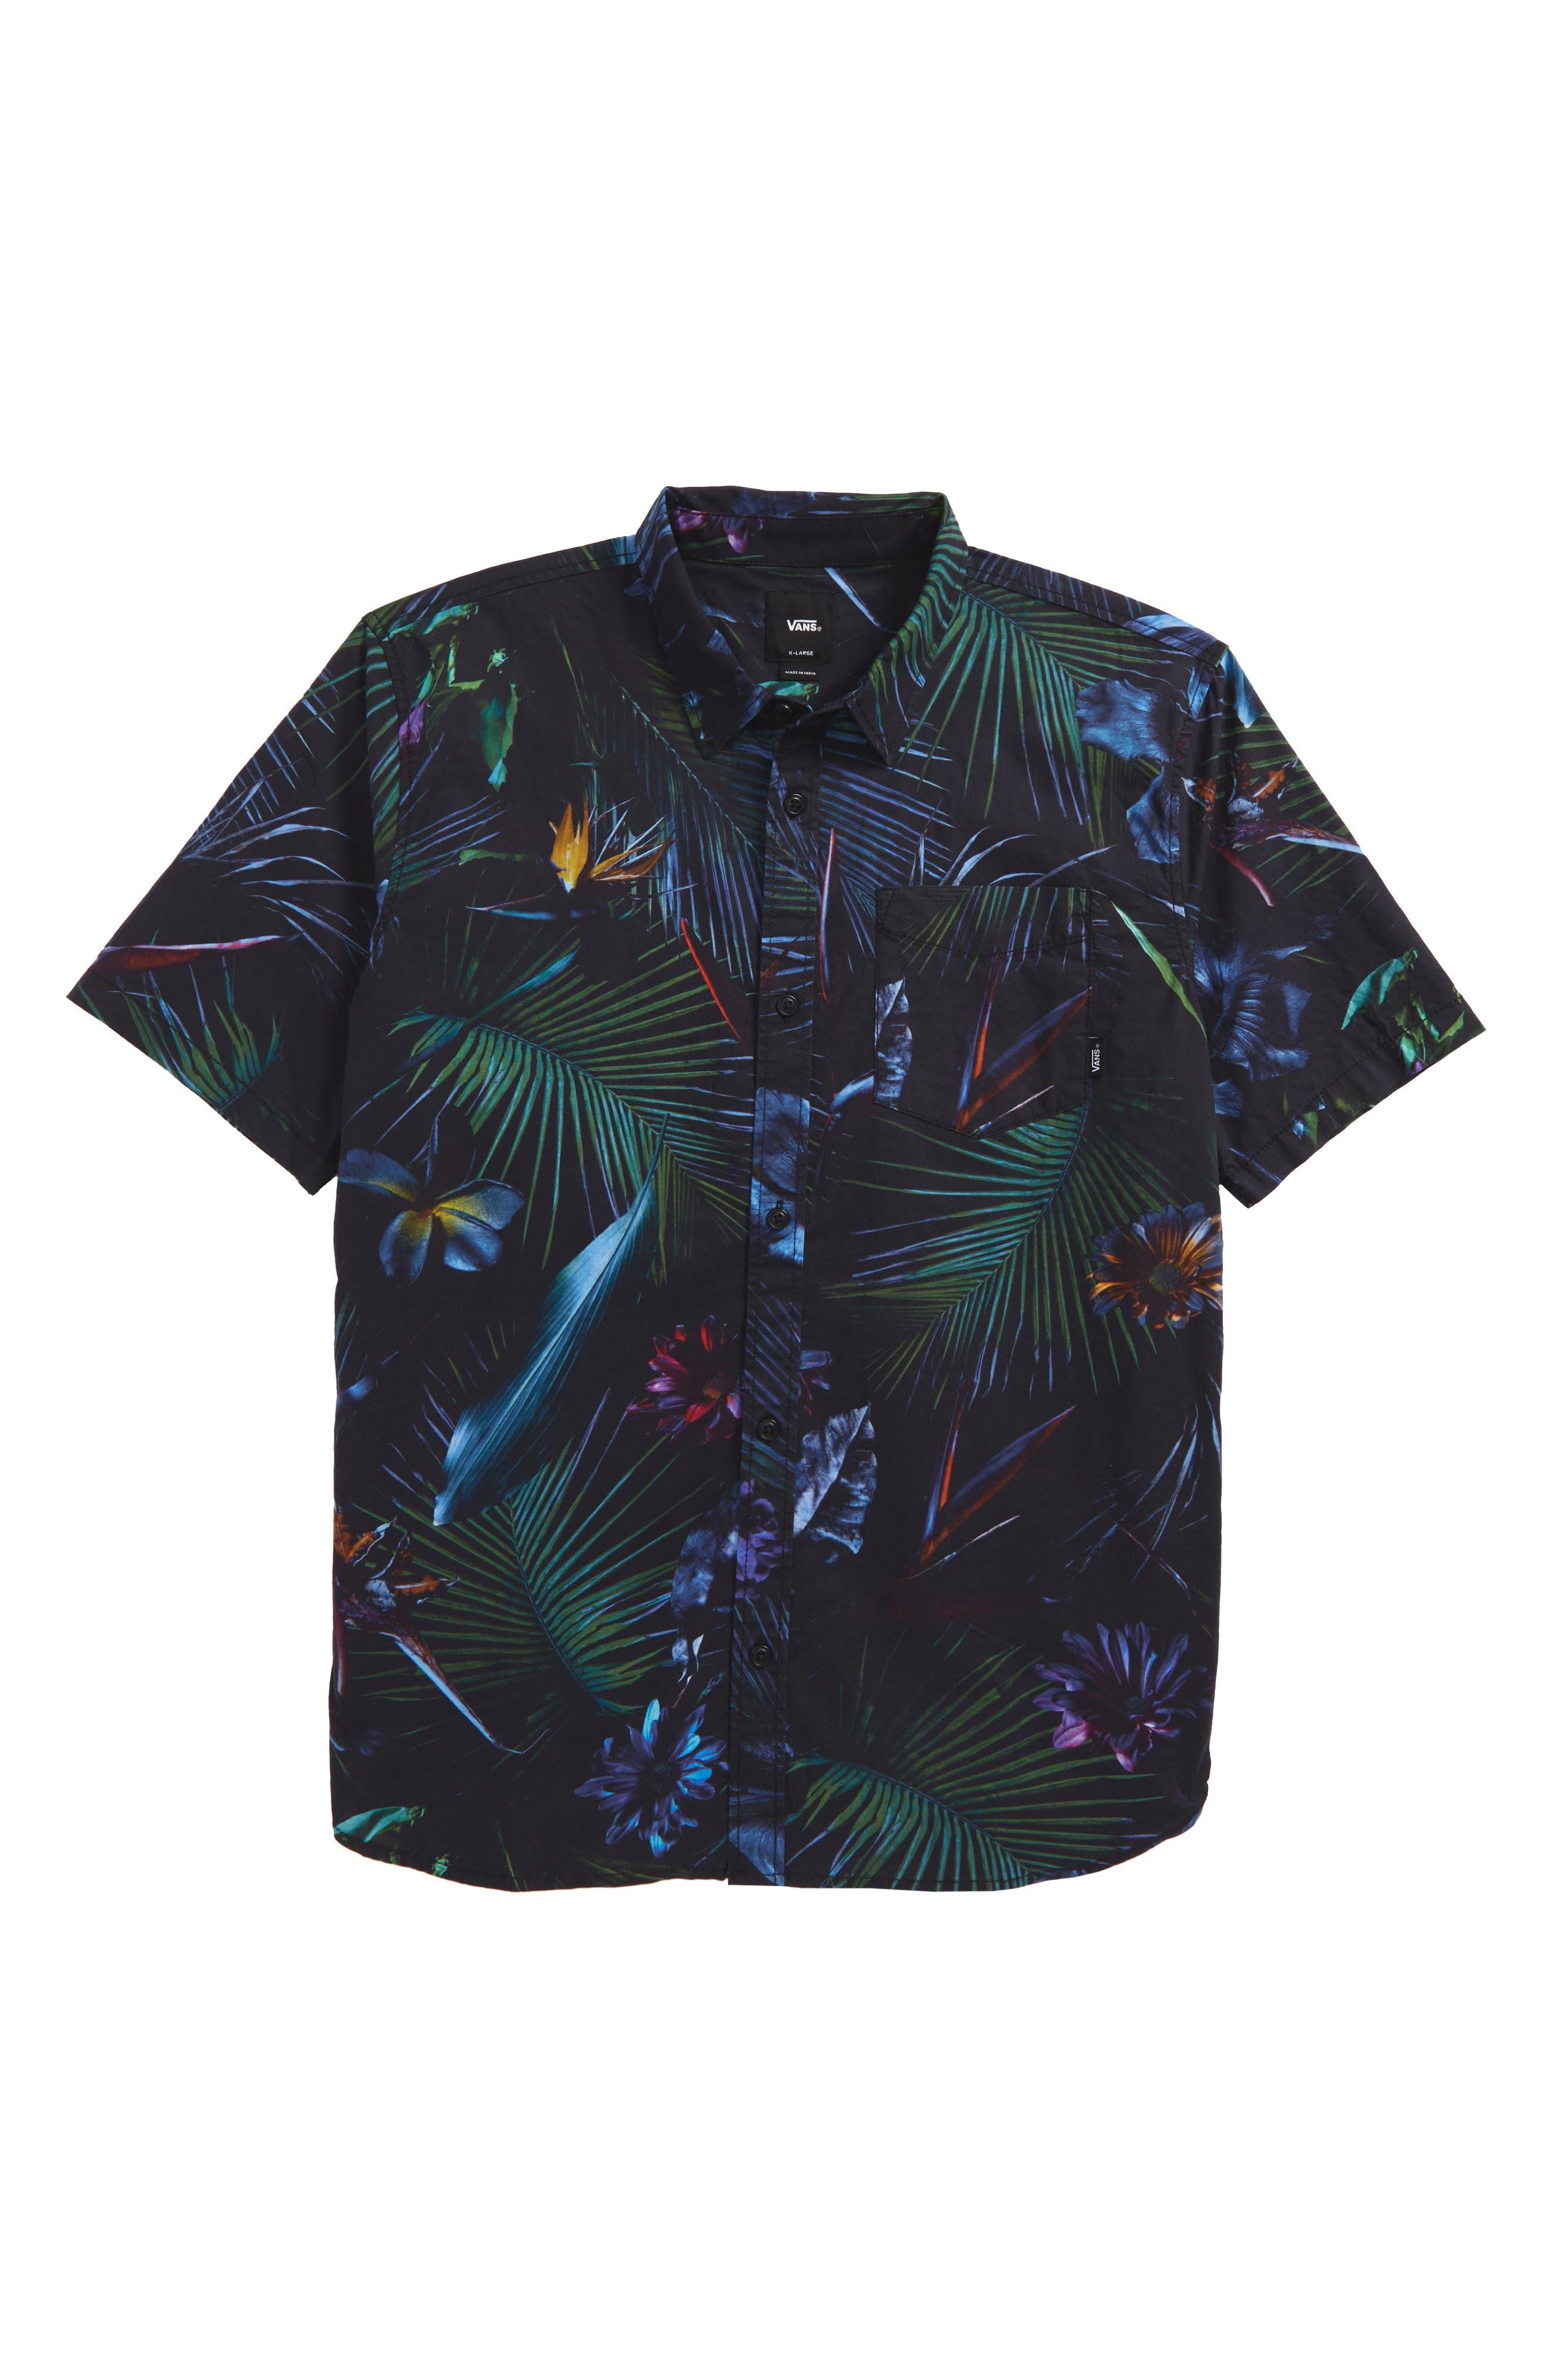 Neo Jungle Short Sleeve Woven Shirt,                             Main thumbnail 1, color,                             001